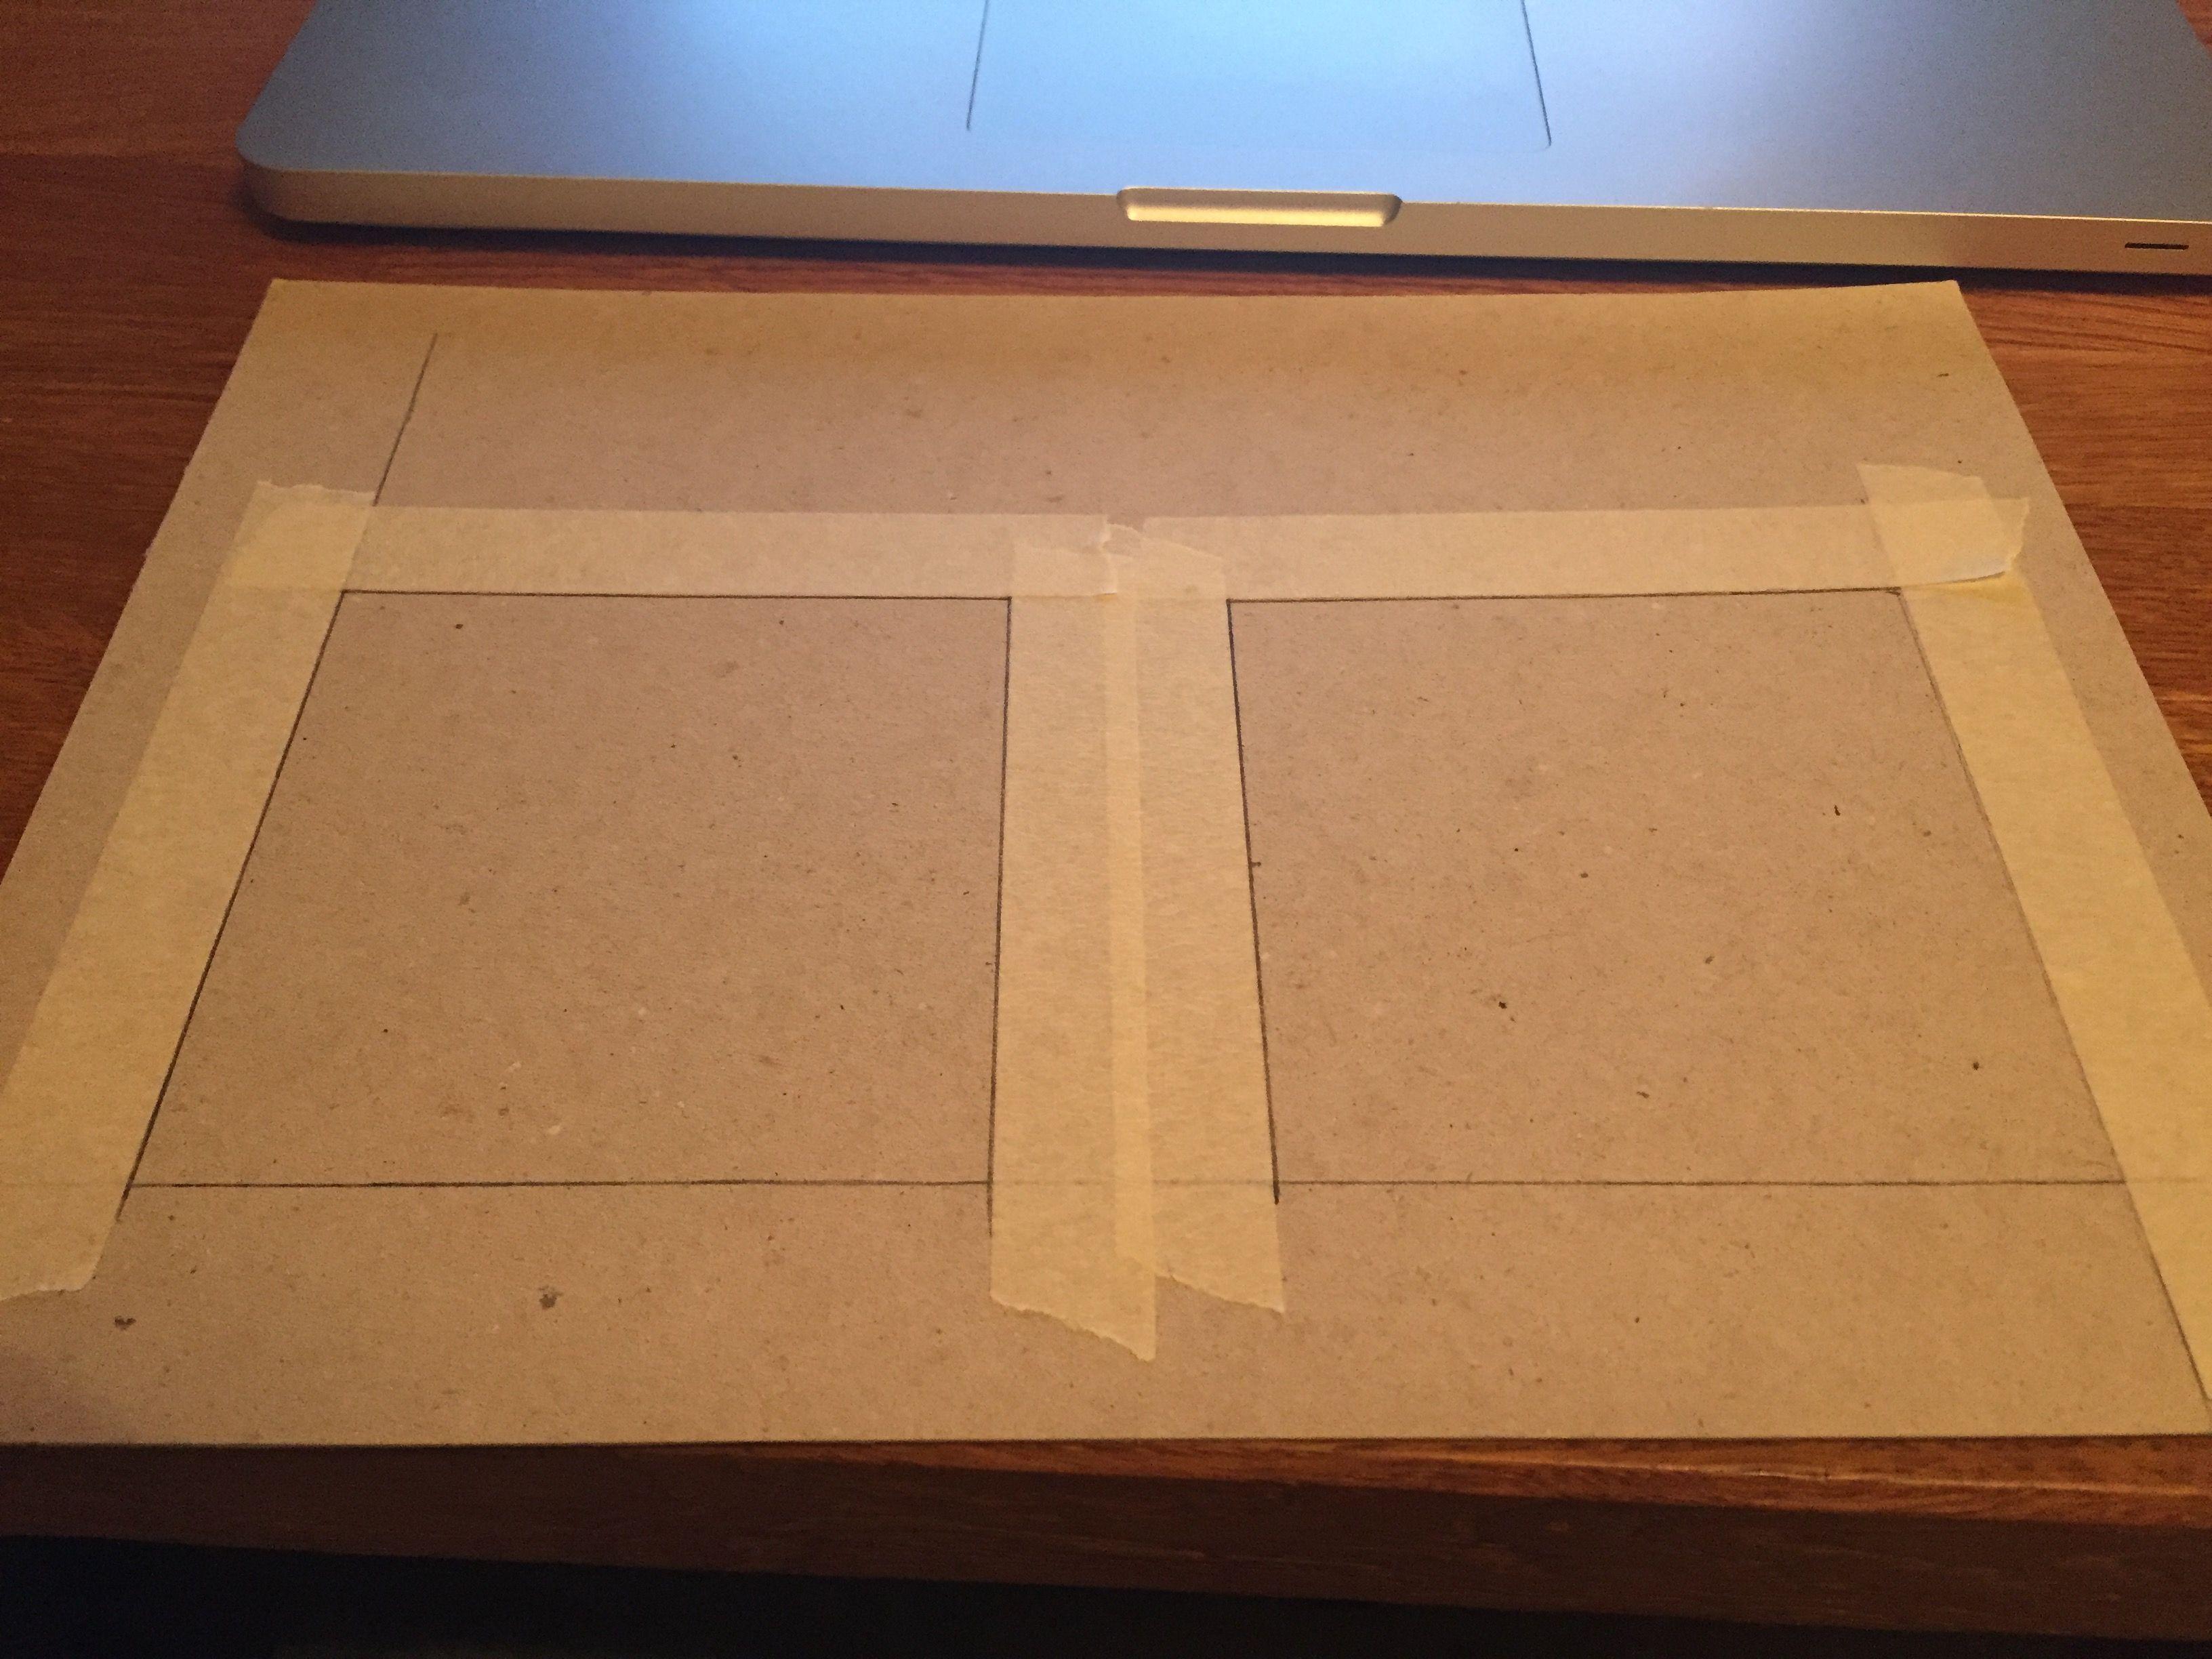 Drawing up proximity pads